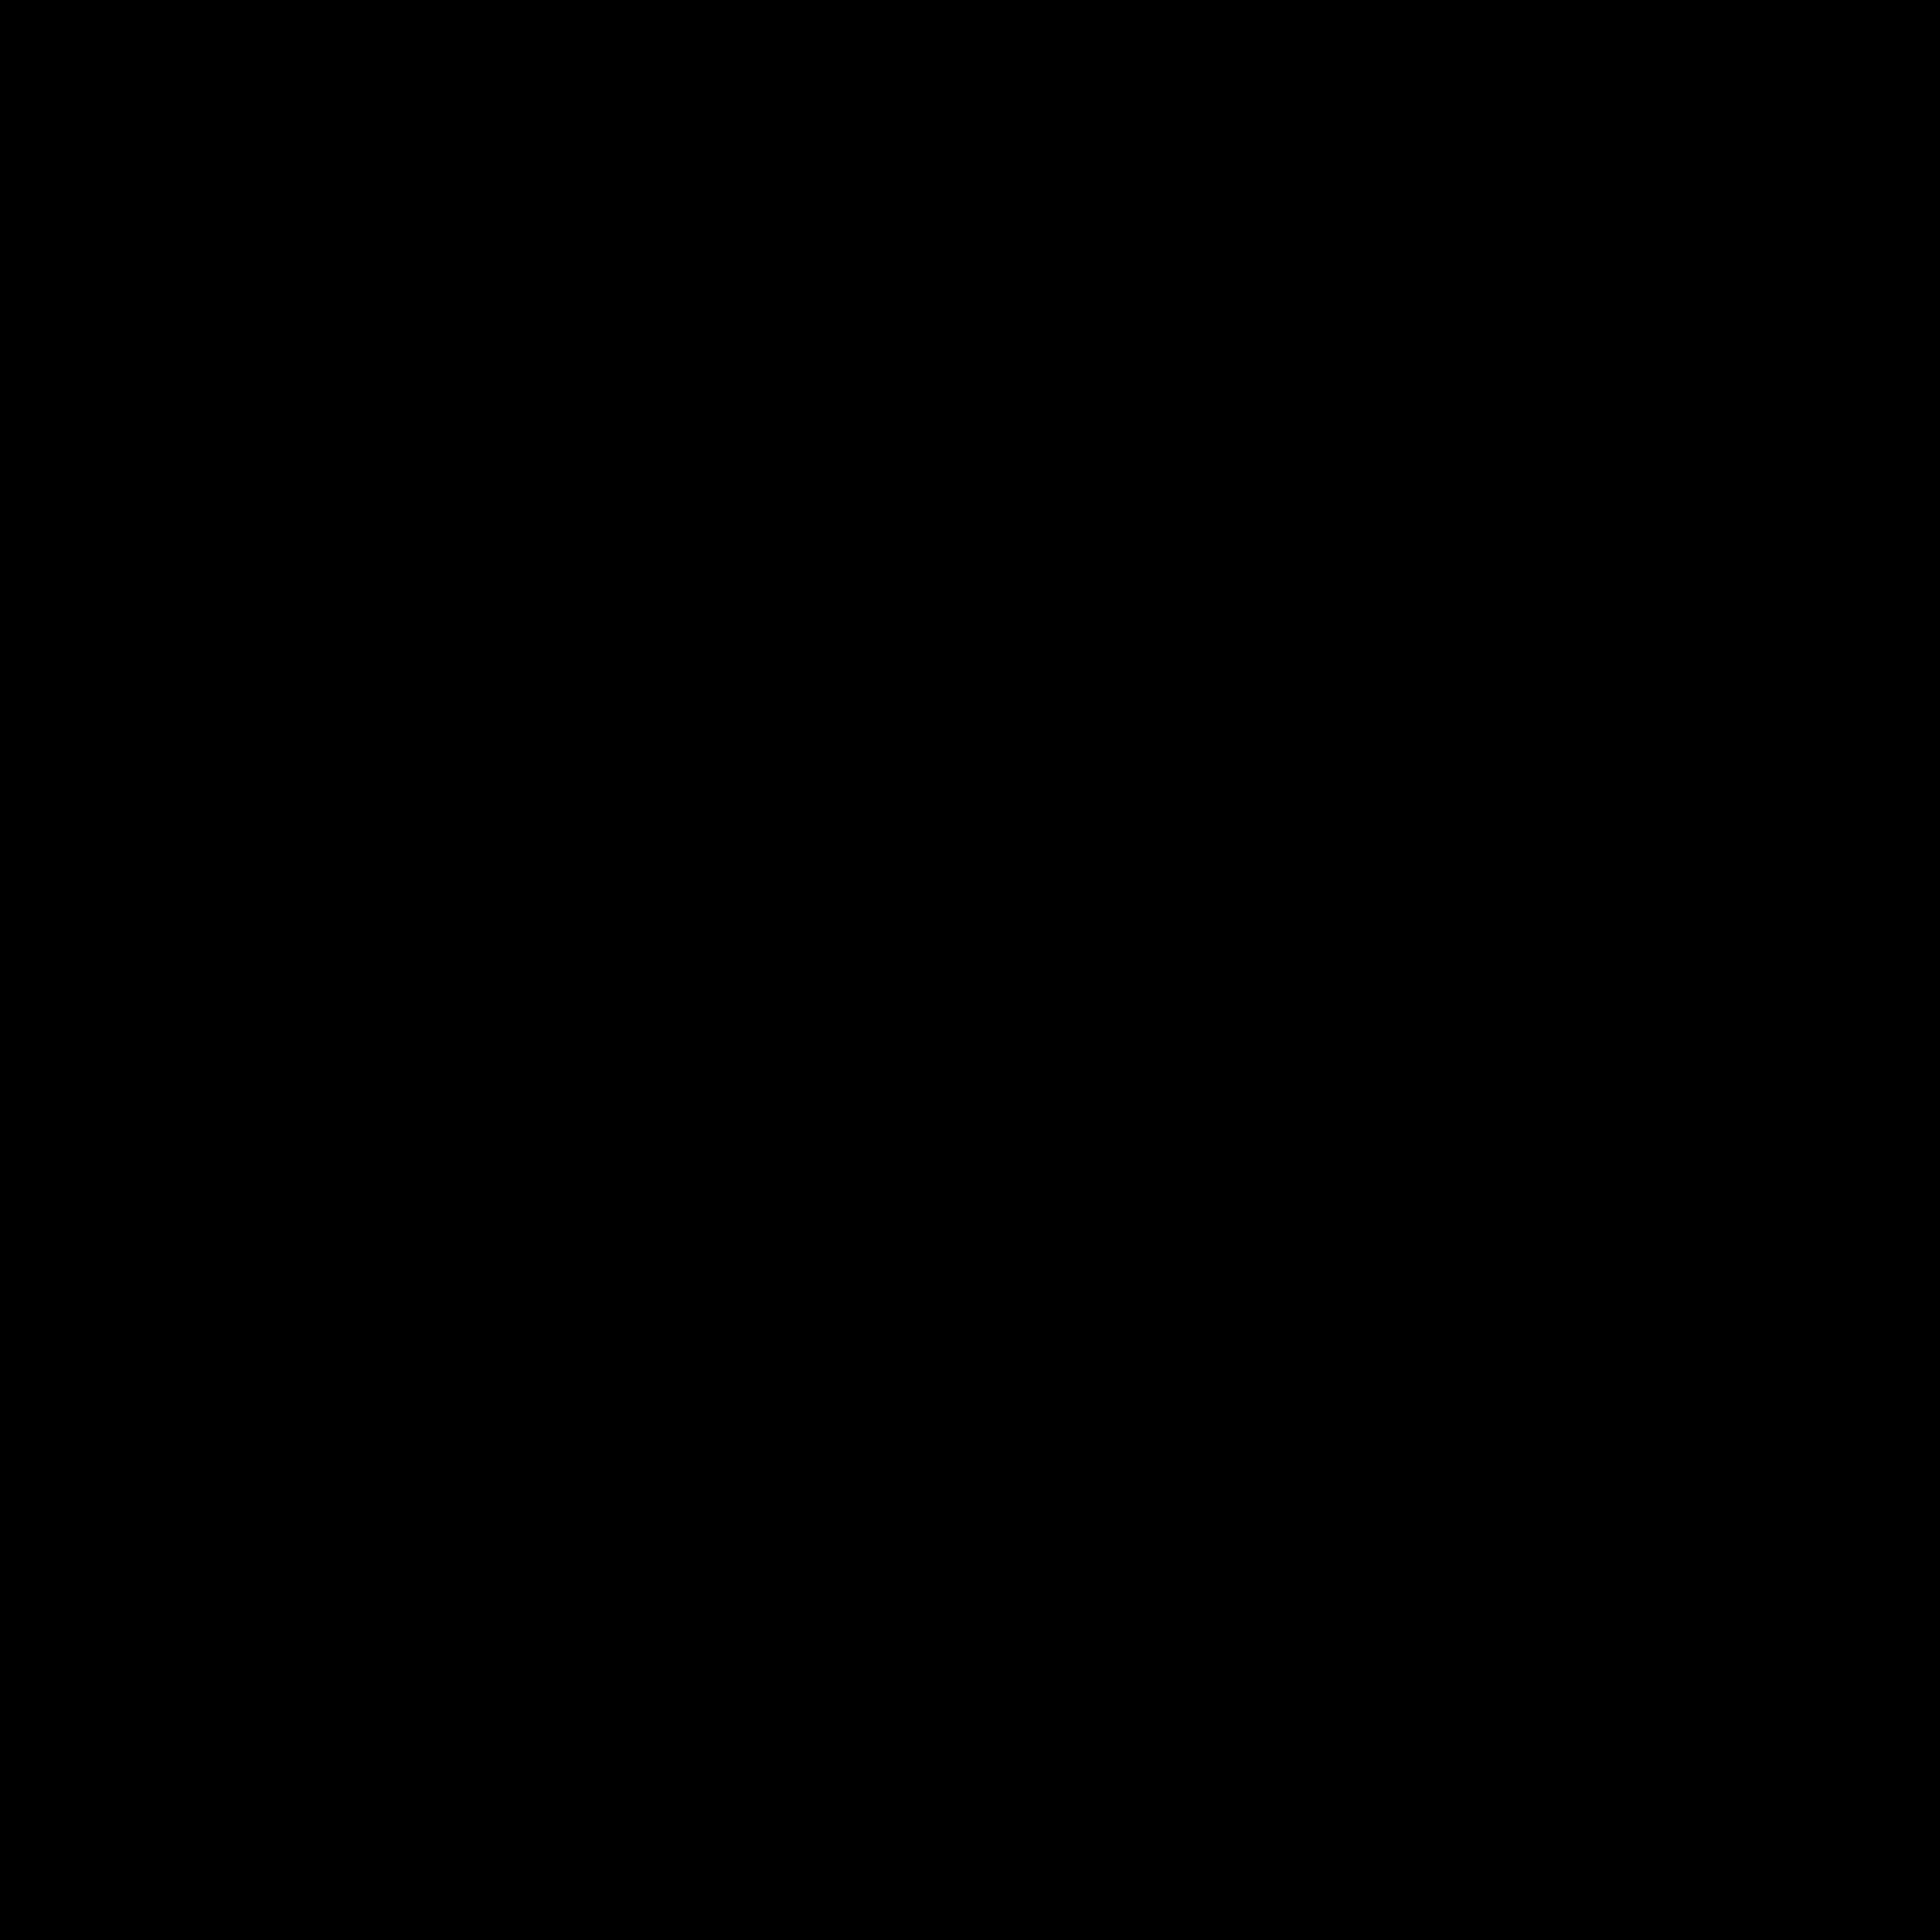 uefa champions league logo 0 - UEFA Champions League Logo